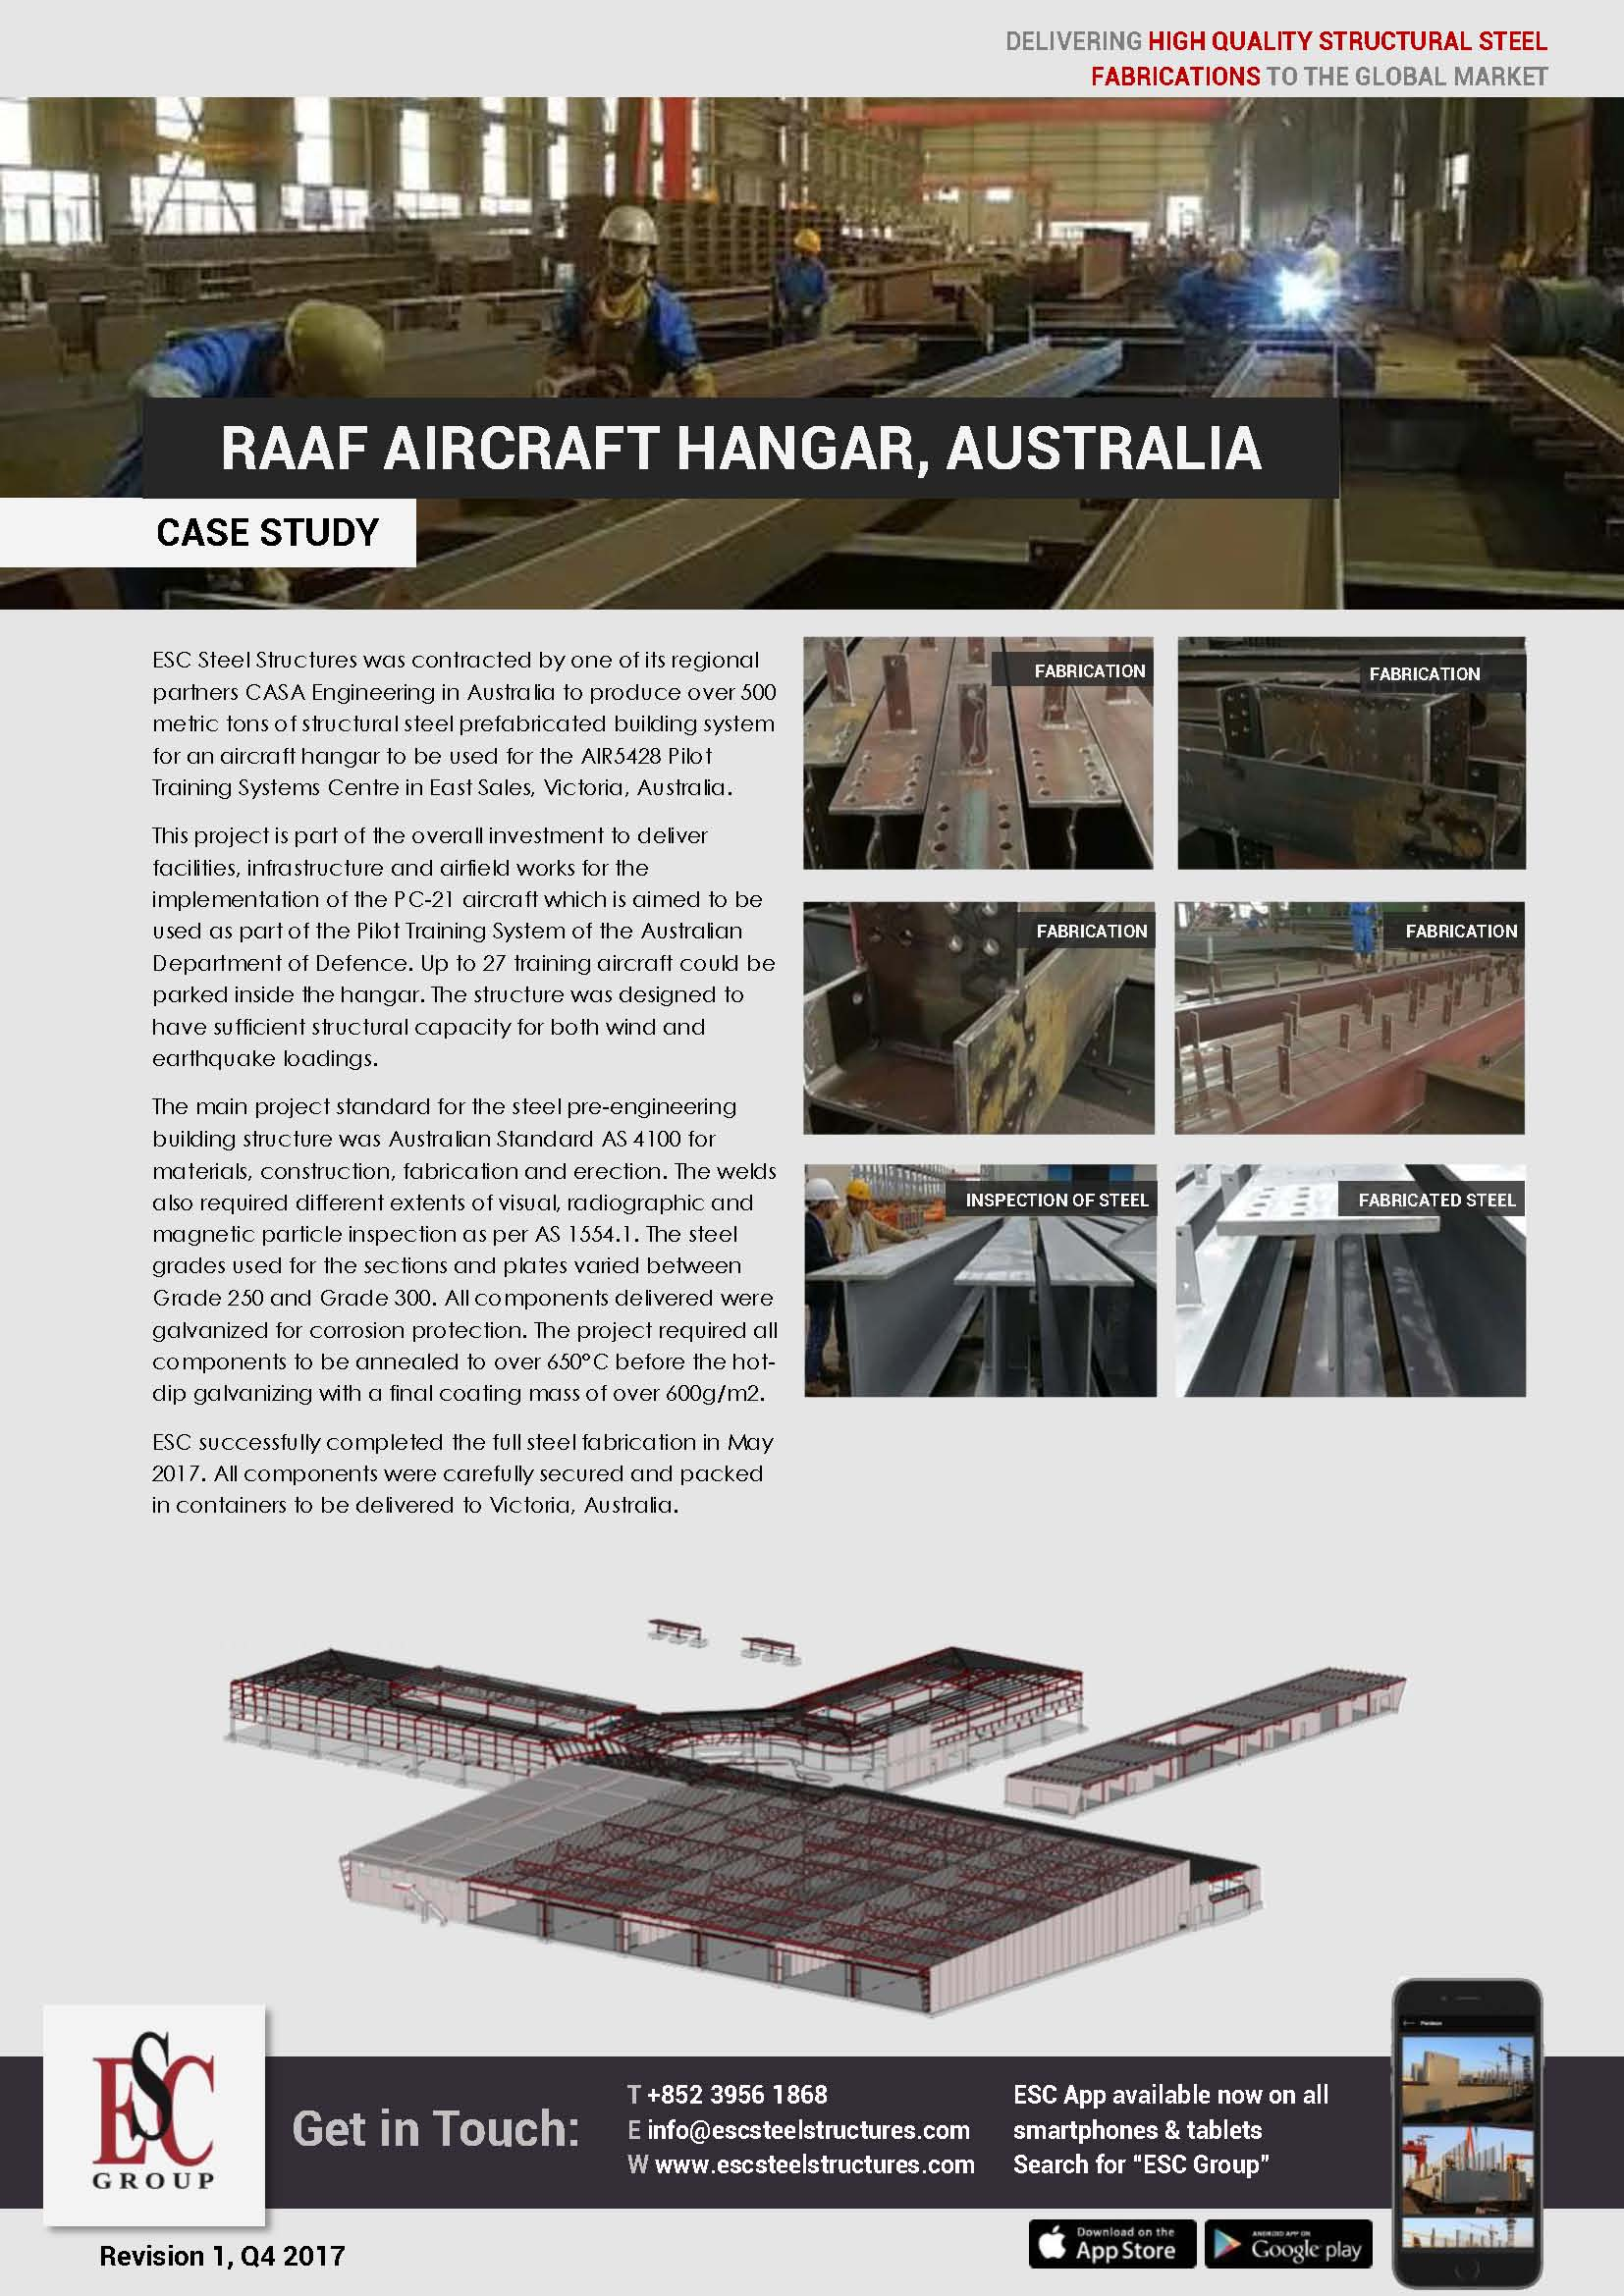 RAAF Aircraft Hangar, Australia